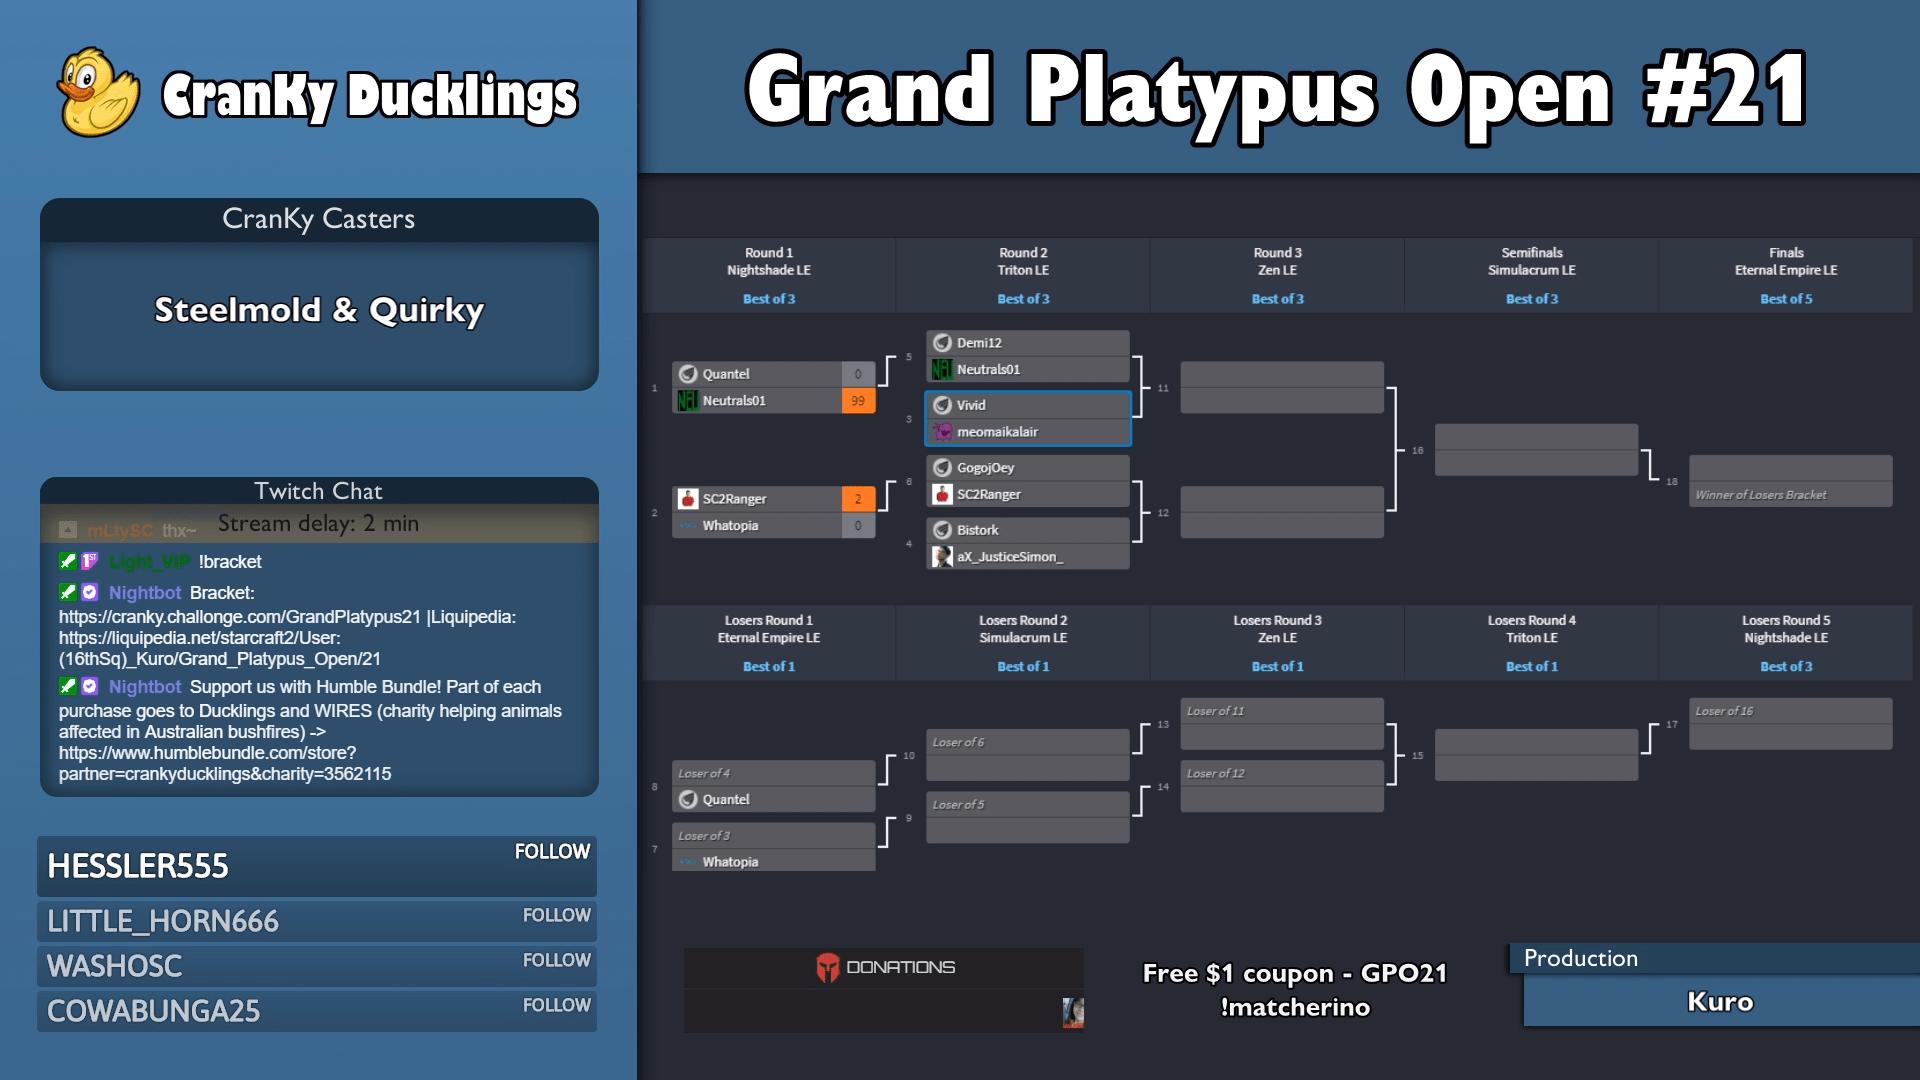 Cranky_Ducklings' Grand Platypus Open #21 StarCraft Tournament Has Begun!